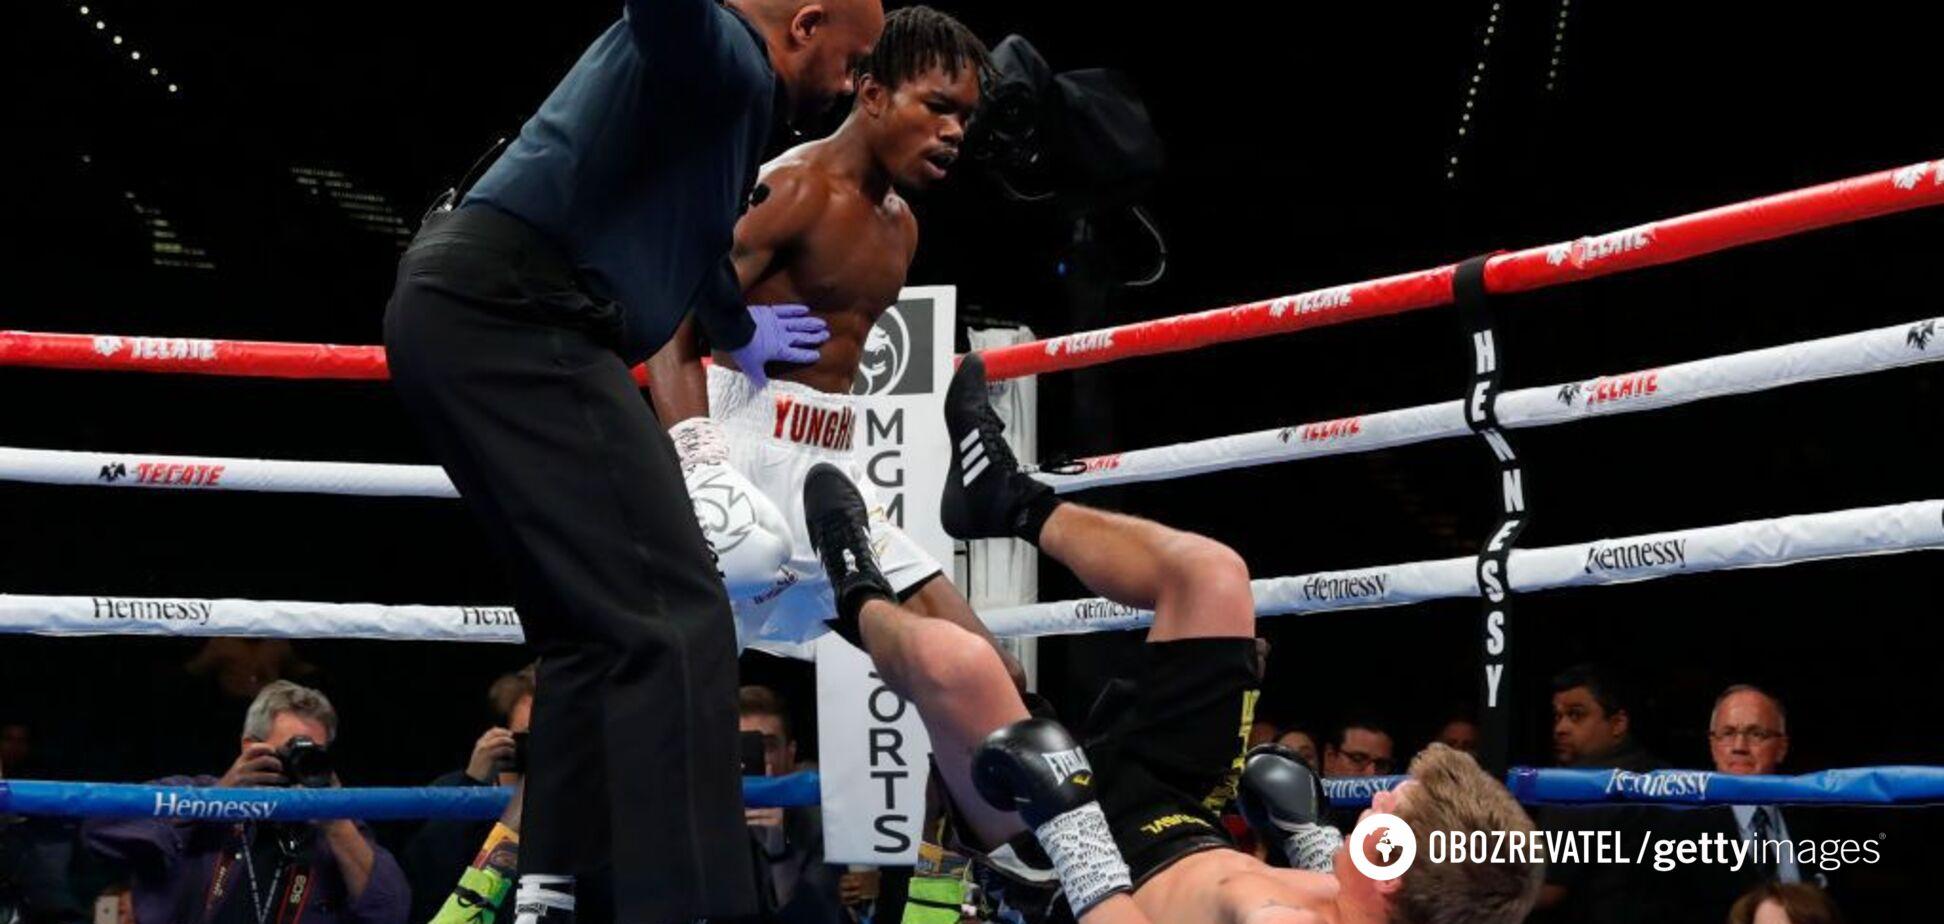 Сын Холифилда ураганным нокаутом за 16 секунд дебютировал в профи-боксе